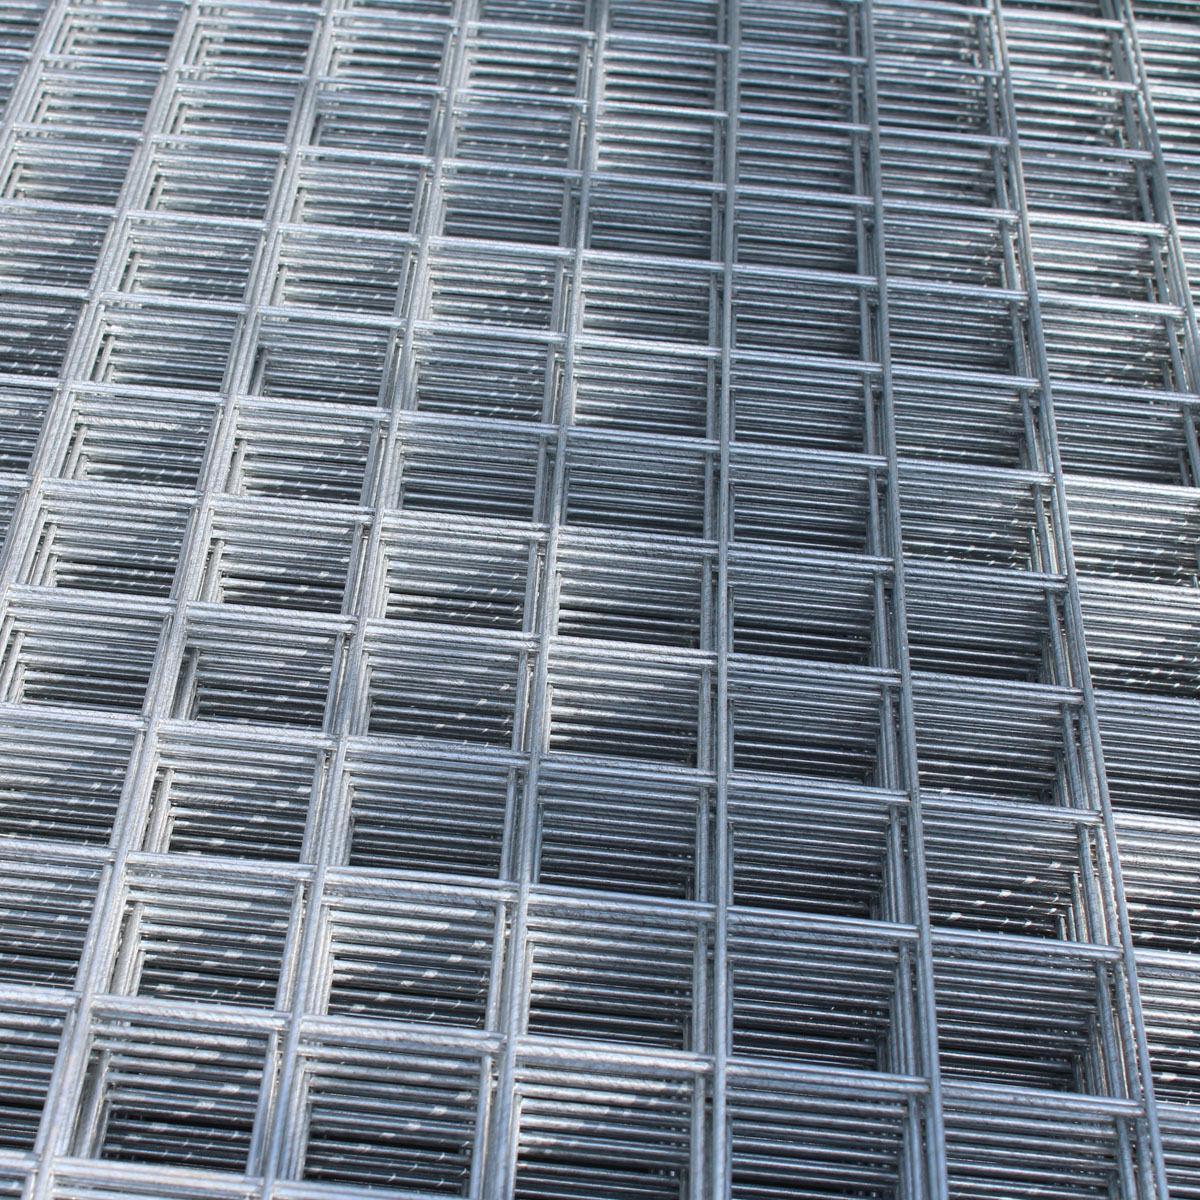 8x Welded Wire Mesh Panels 1.2x2.4m Galvanised 4x8ft Steel Sheet ...